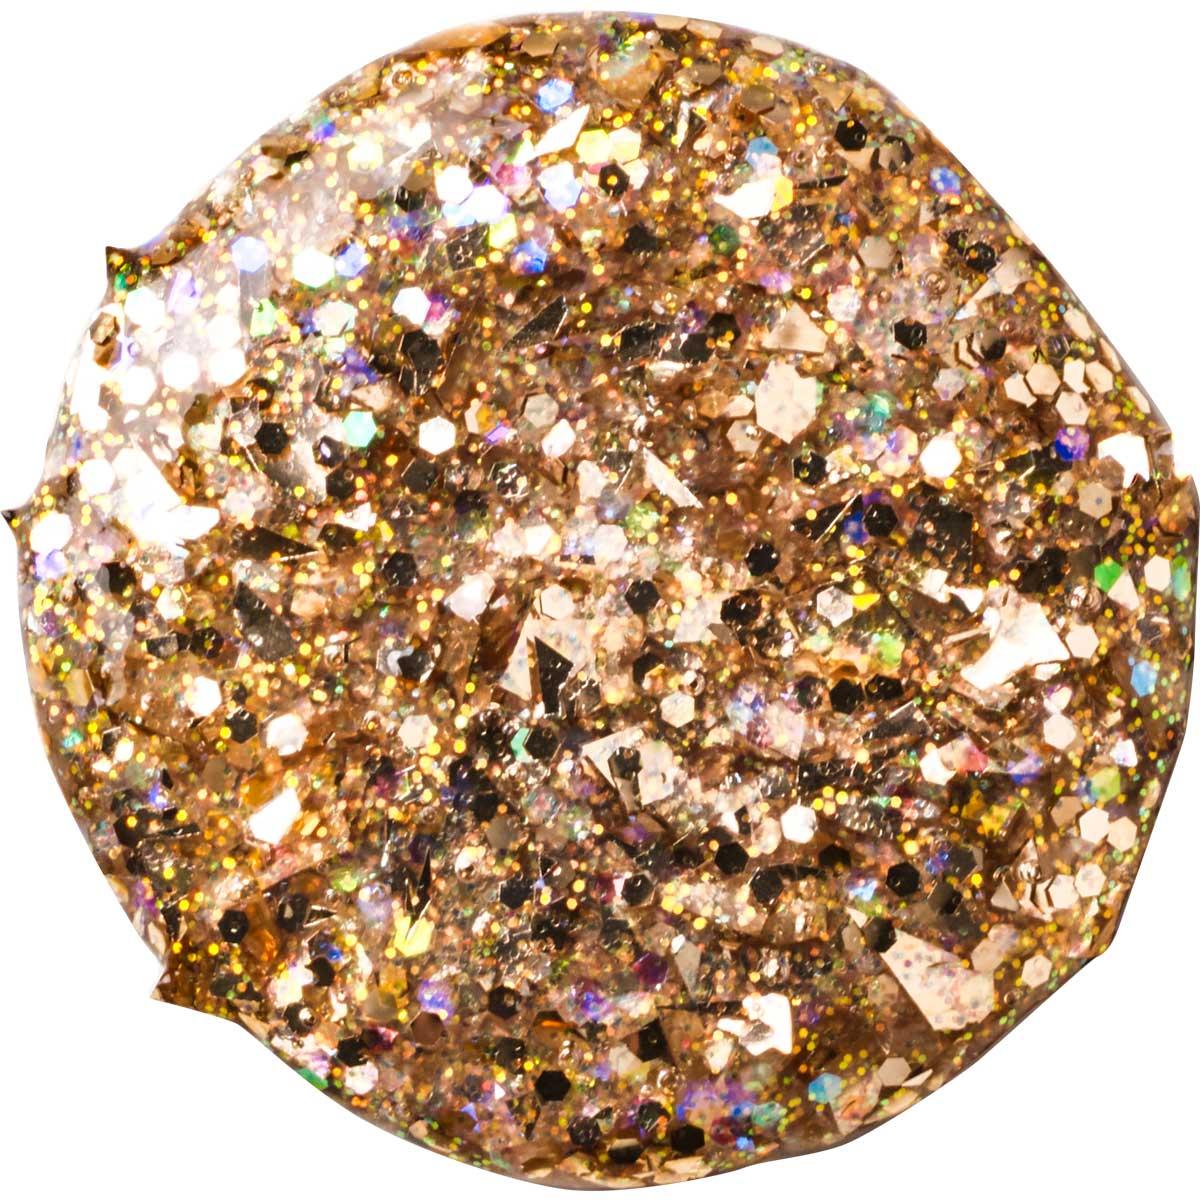 FolkArt ® Glitterific™ Acrylic Paint - Rose Gold, 2 oz. - 5877